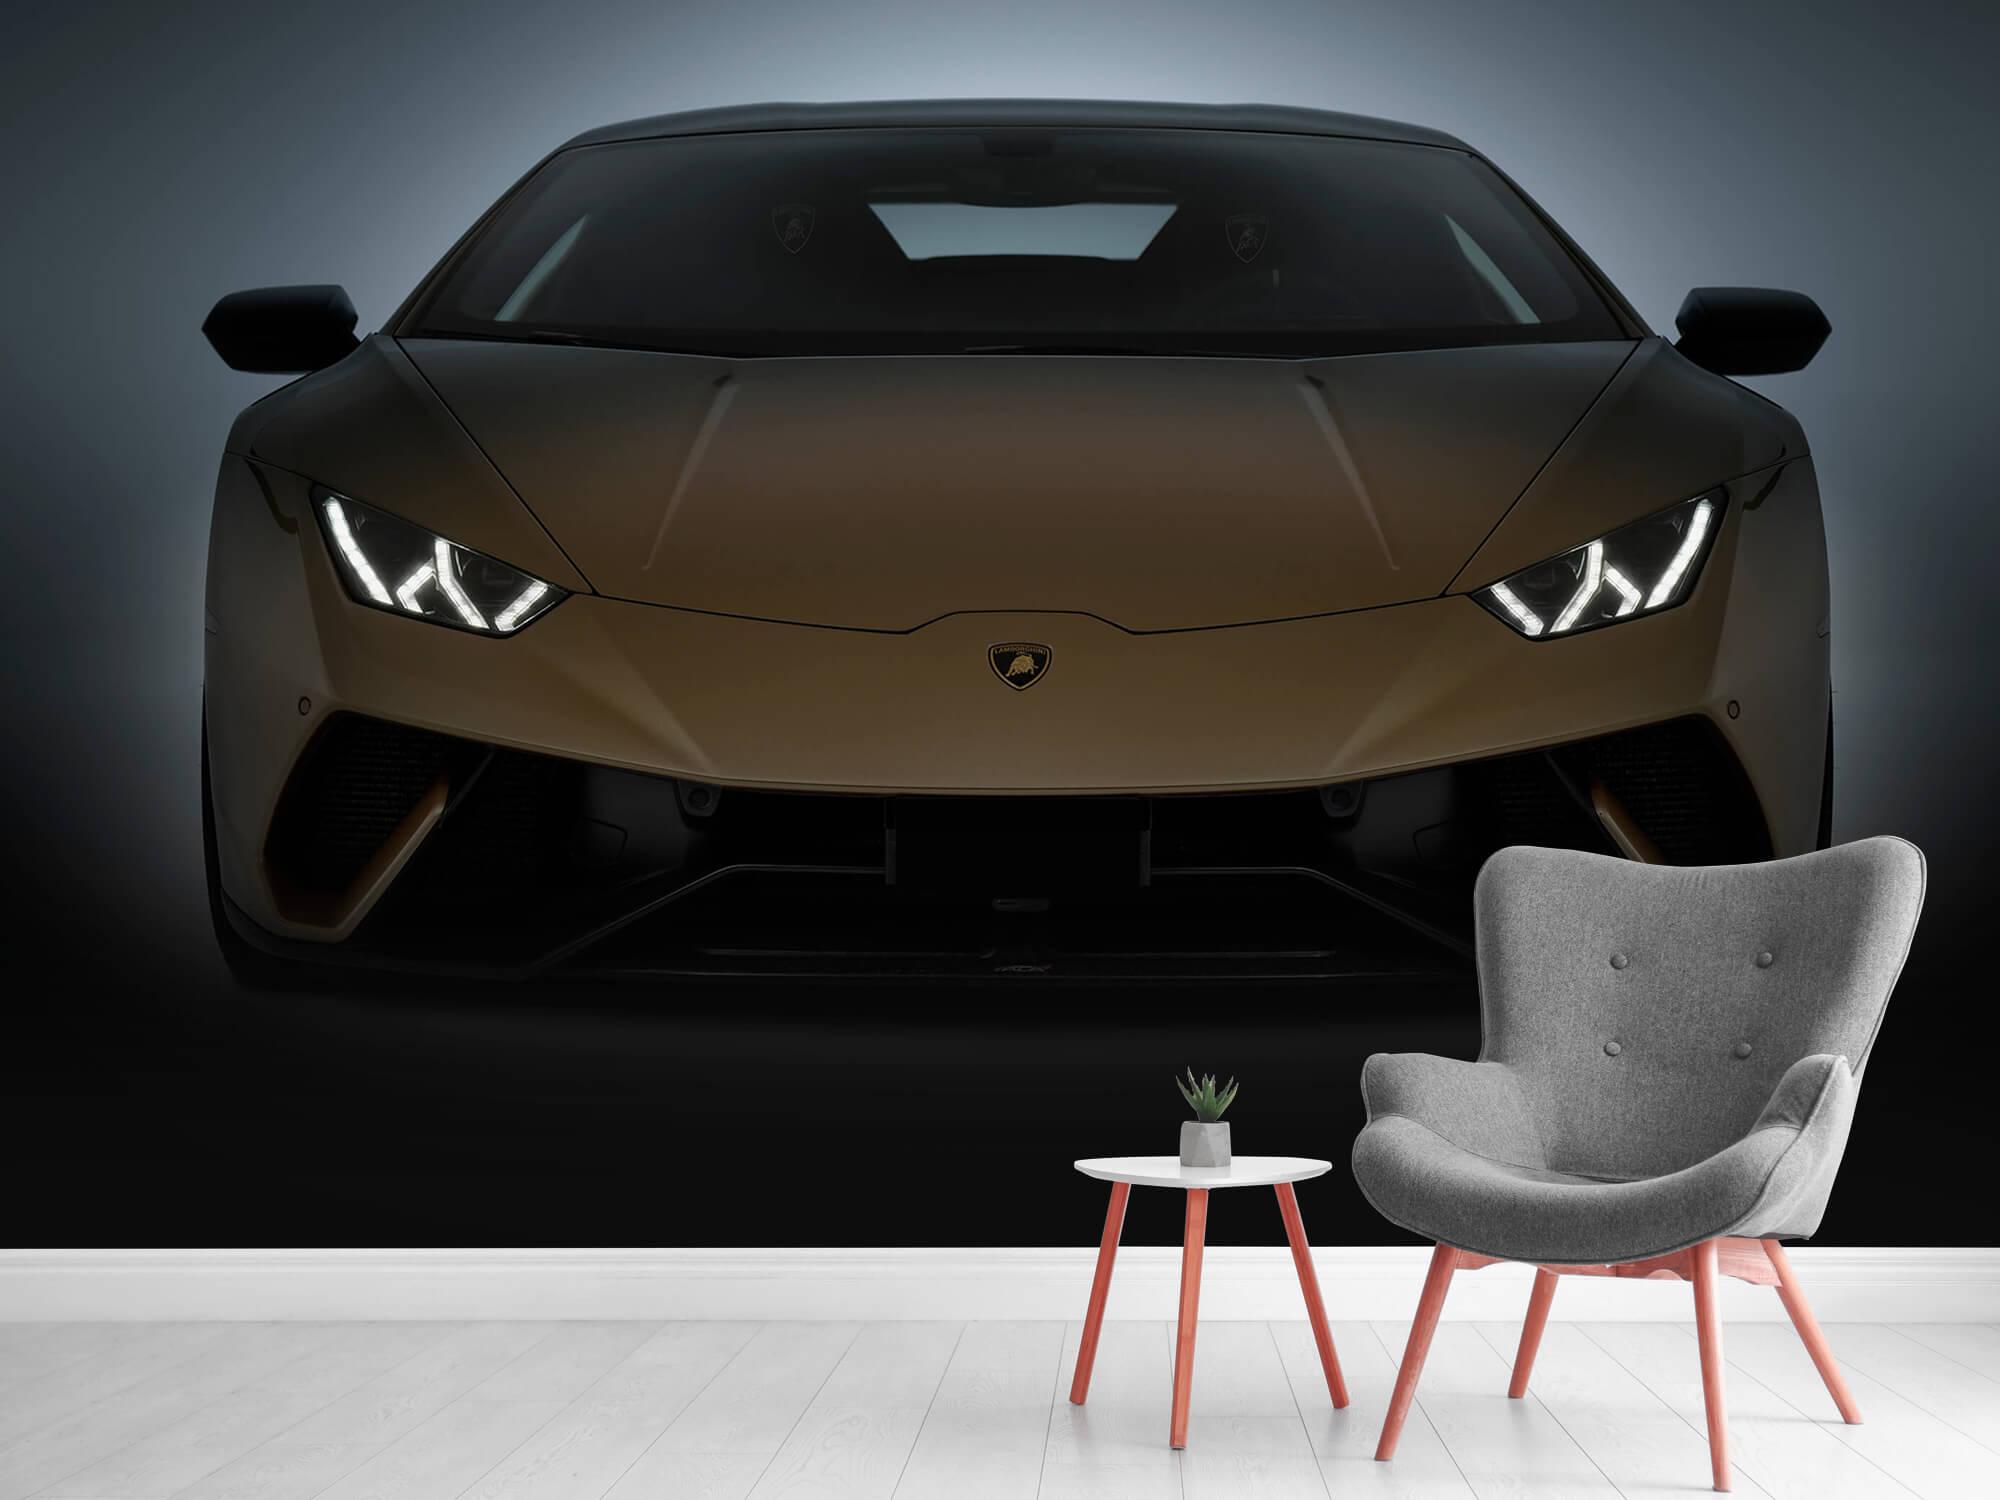 Wallpaper Lamborghini Huracán - Huracán - Fram 2